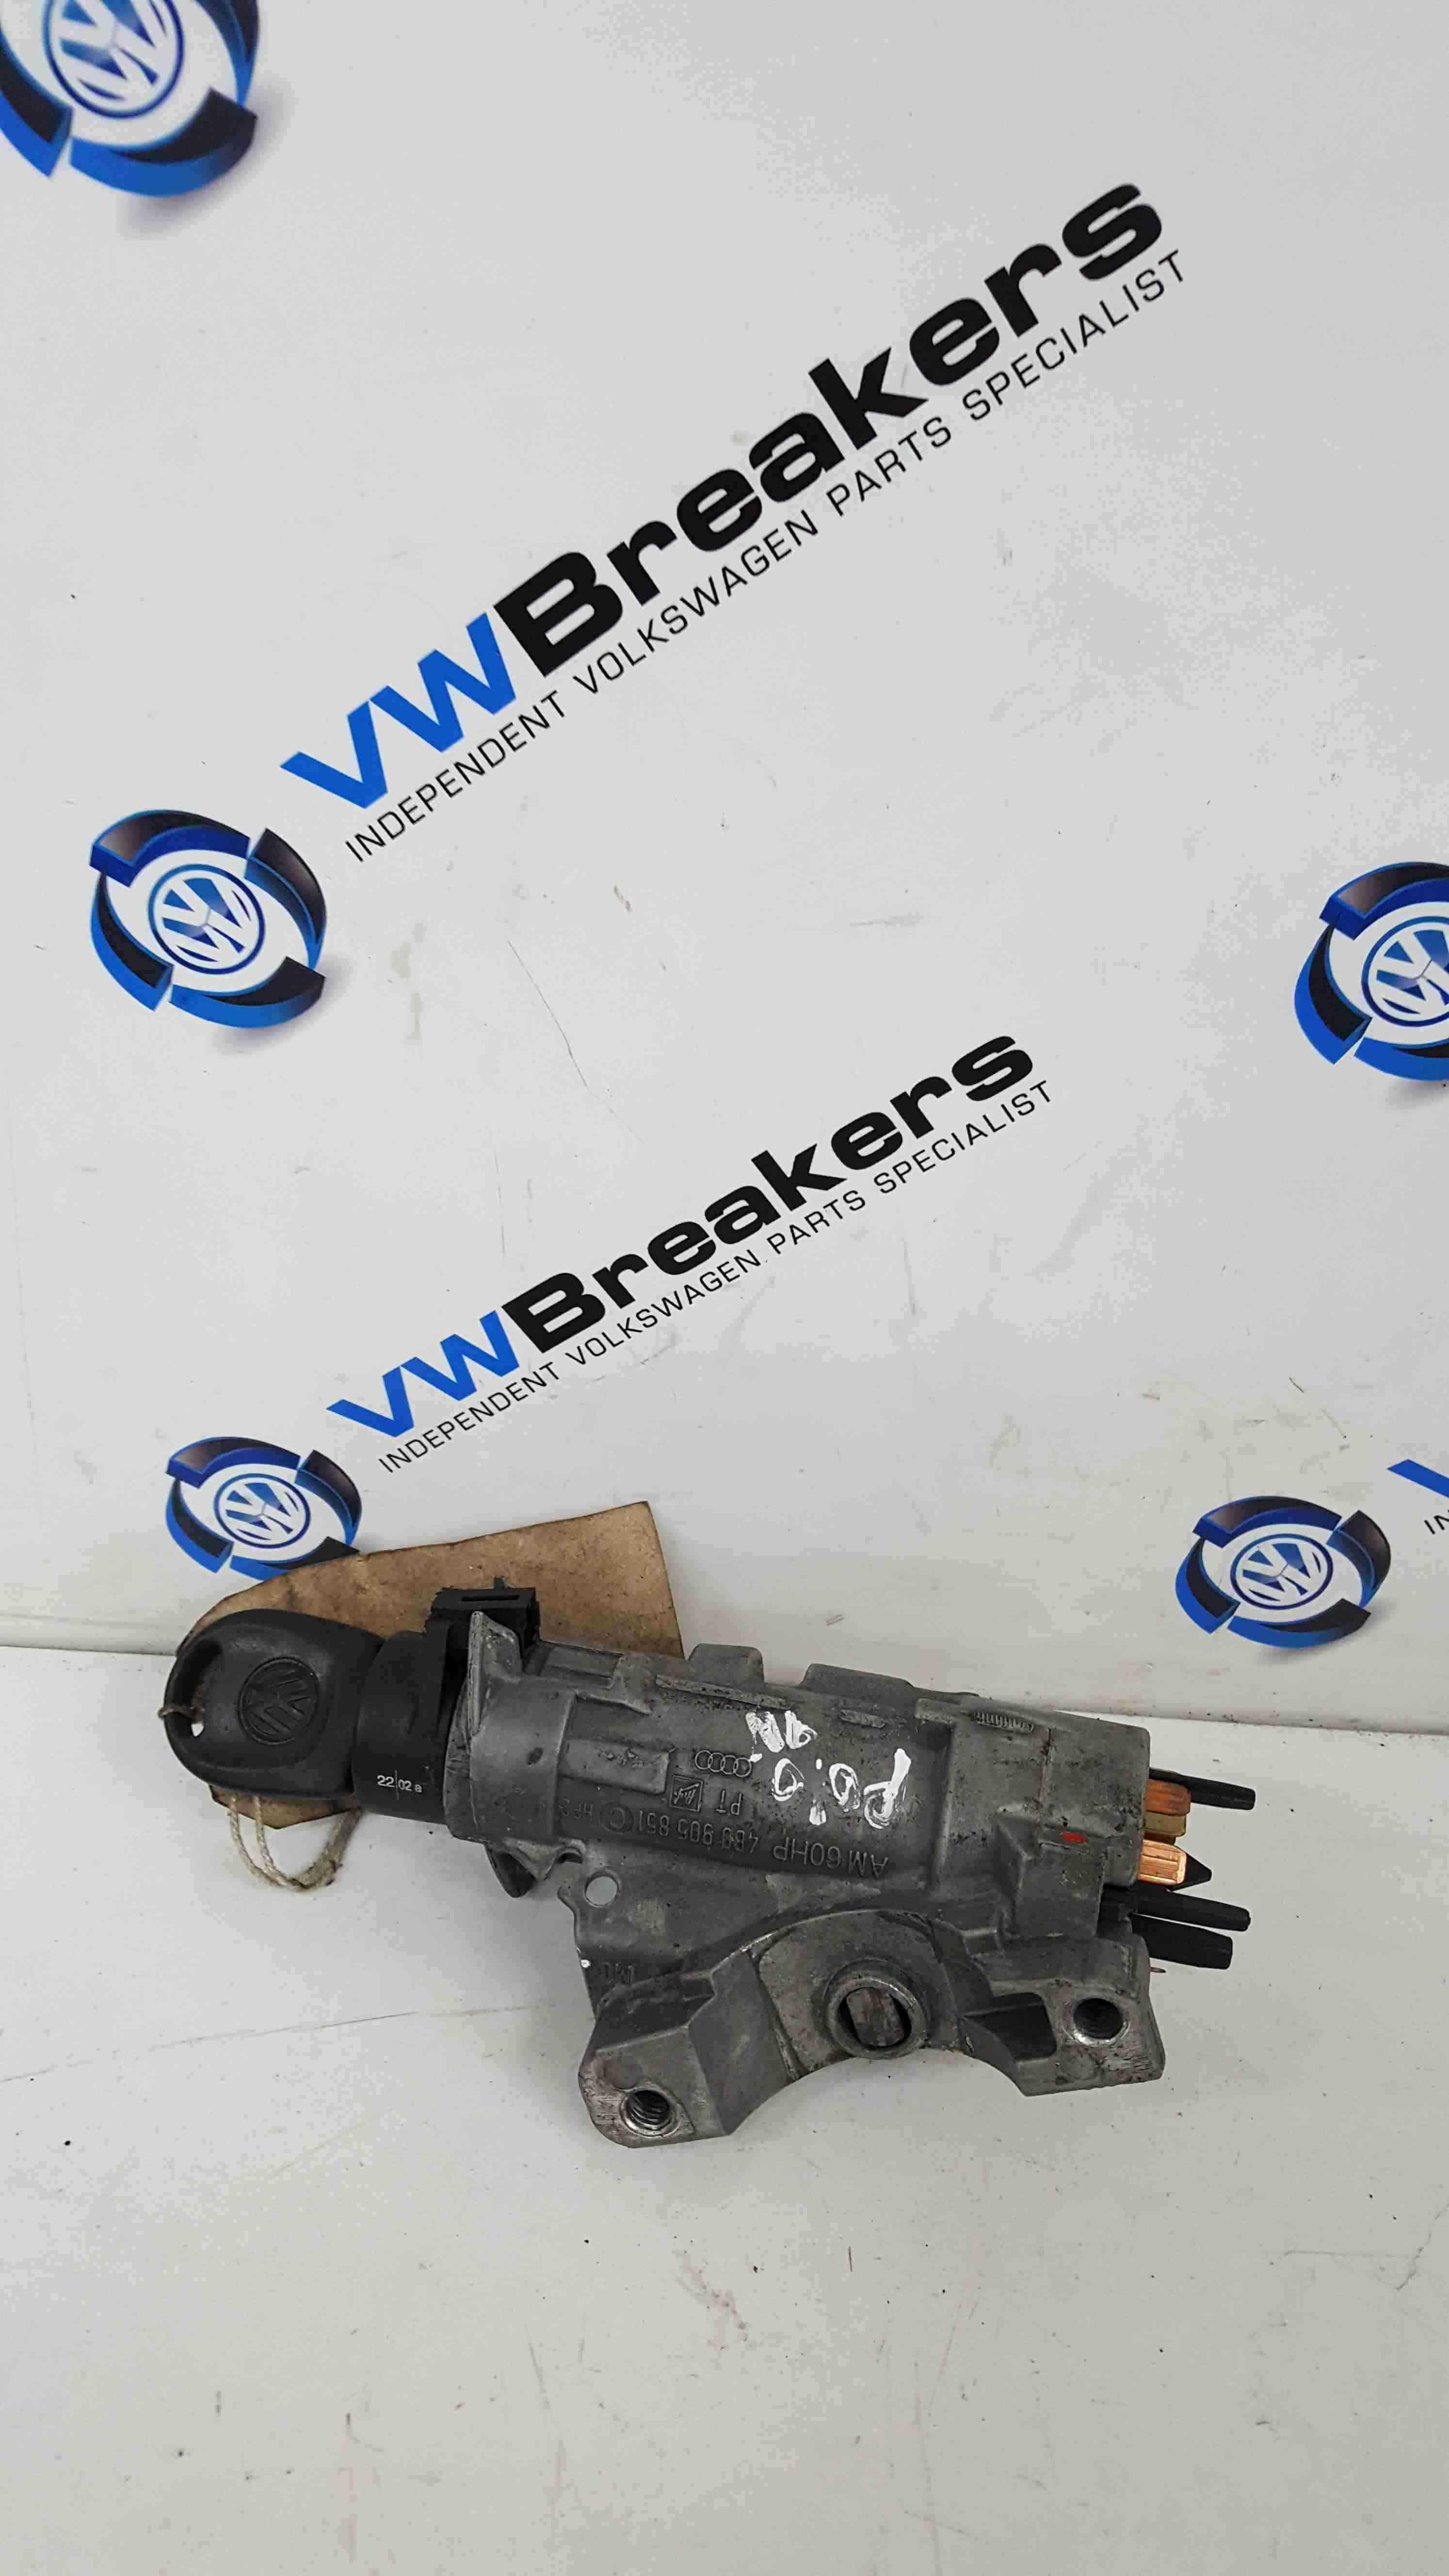 Volkswagen Polo 9N 2003-2006 Ignition Barrel + Key 4B0905851C